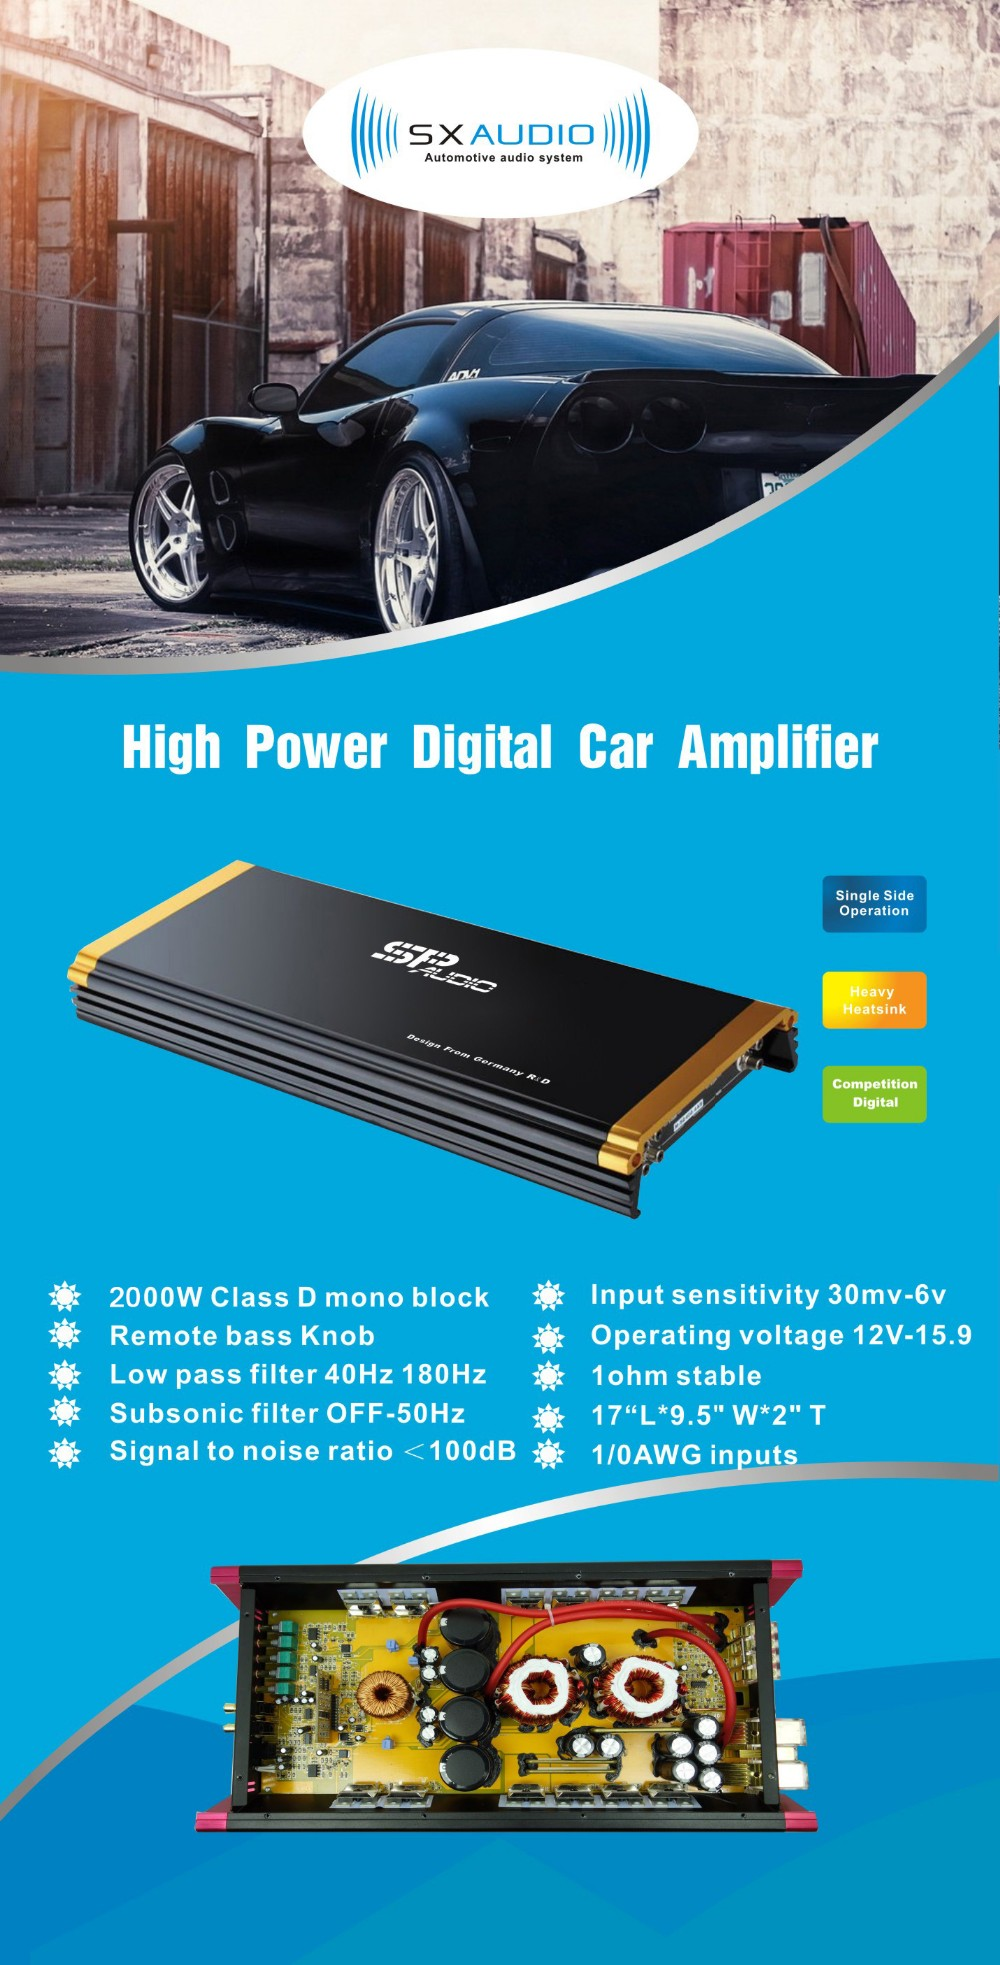 High End 2000w Car Audio Amplifierprofessional Amplifier Class Amplifiers From A To T D Monocar